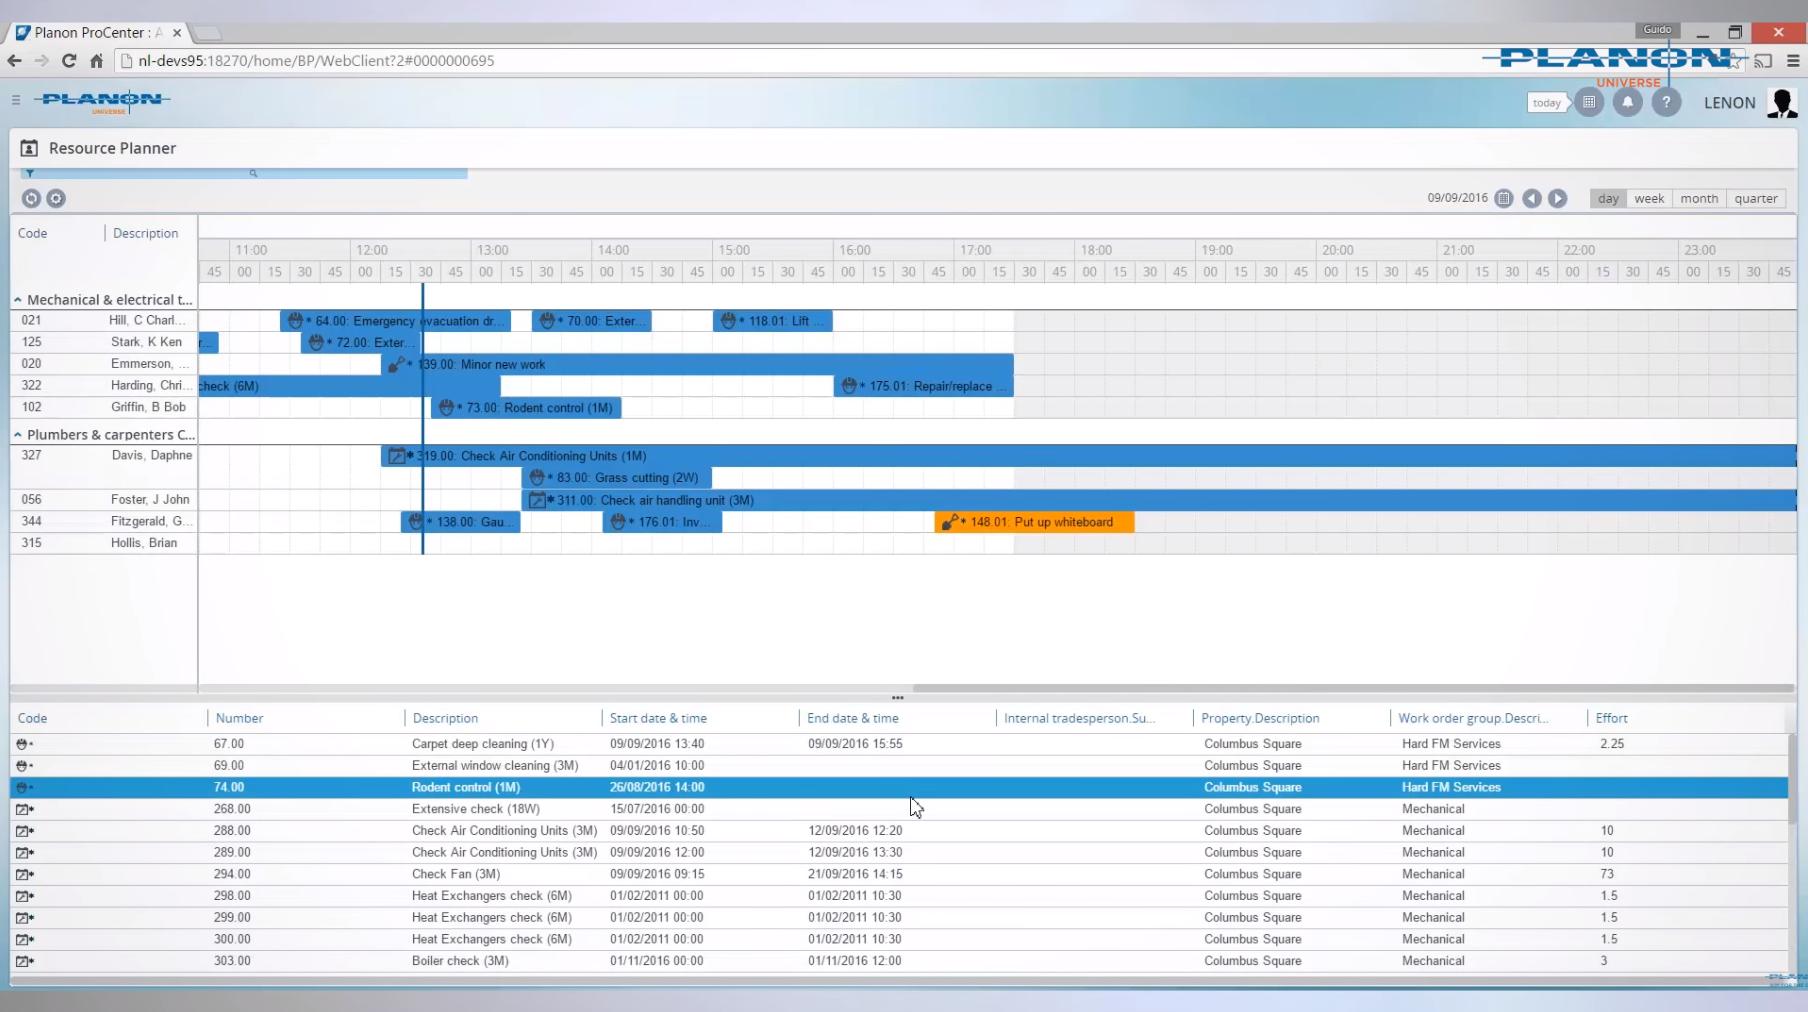 Planon Universe resource planner screenshot